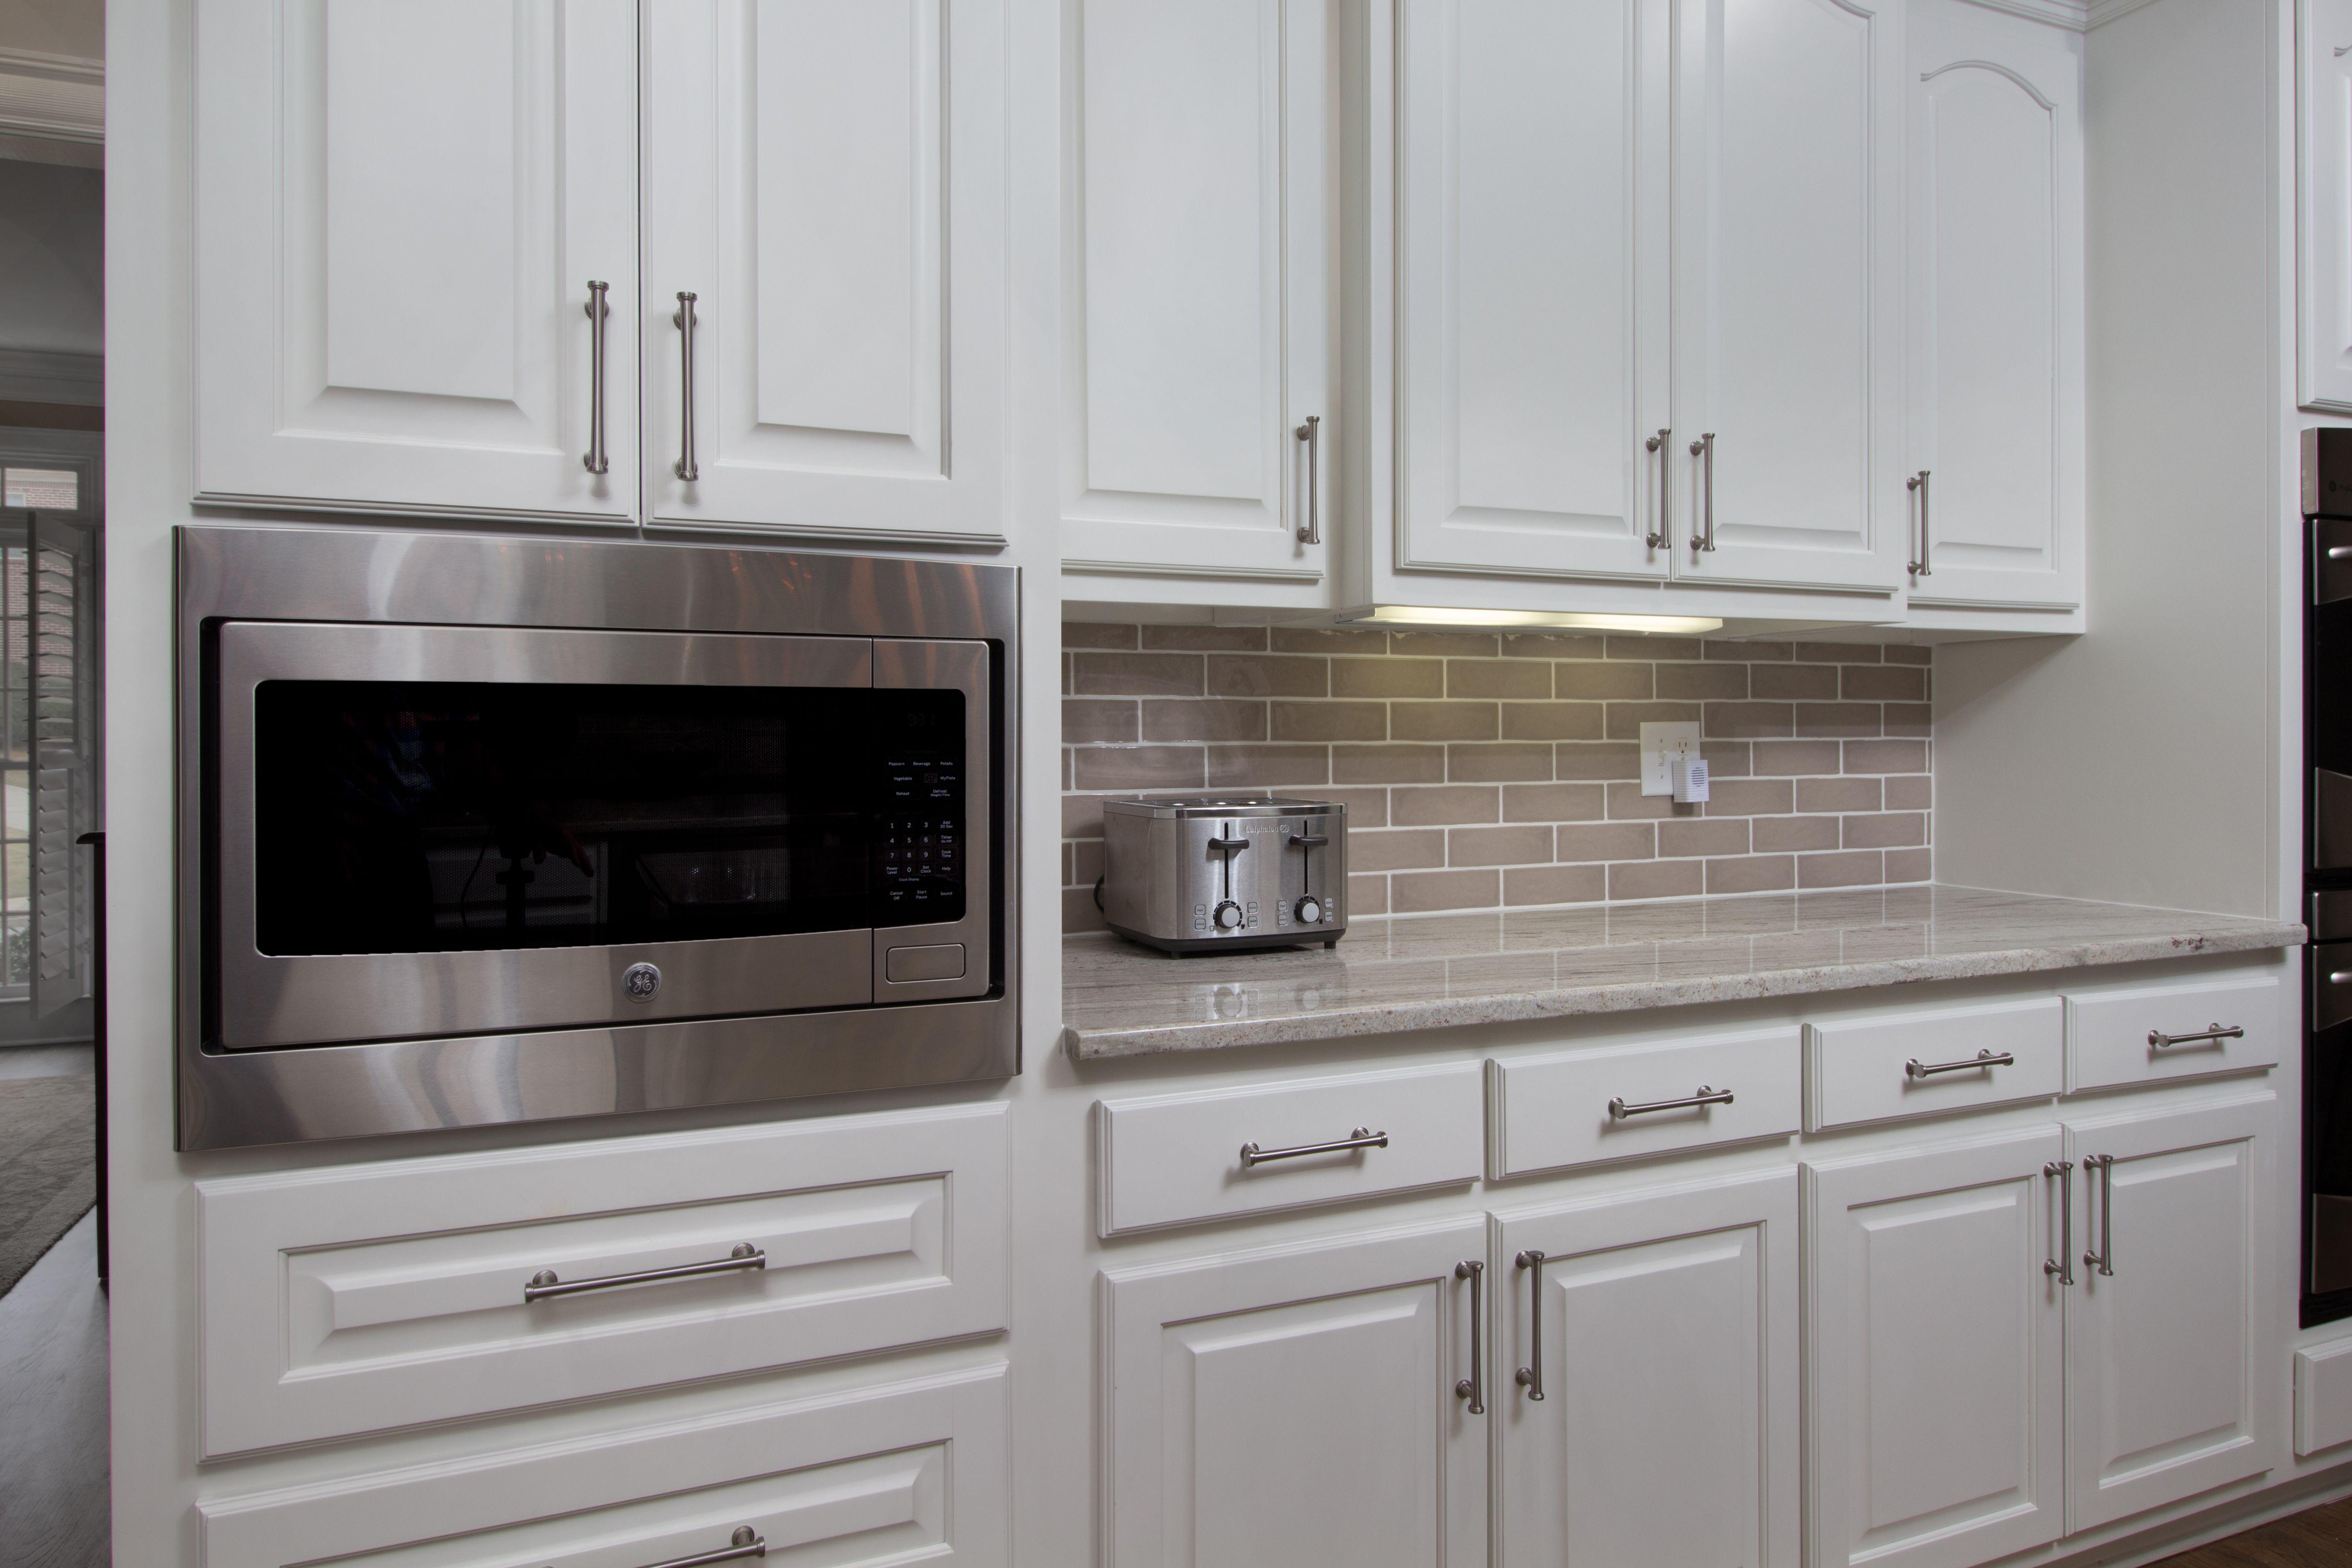 Home Kitchen Cabinets Above Kitchen Cabinets Kitchen